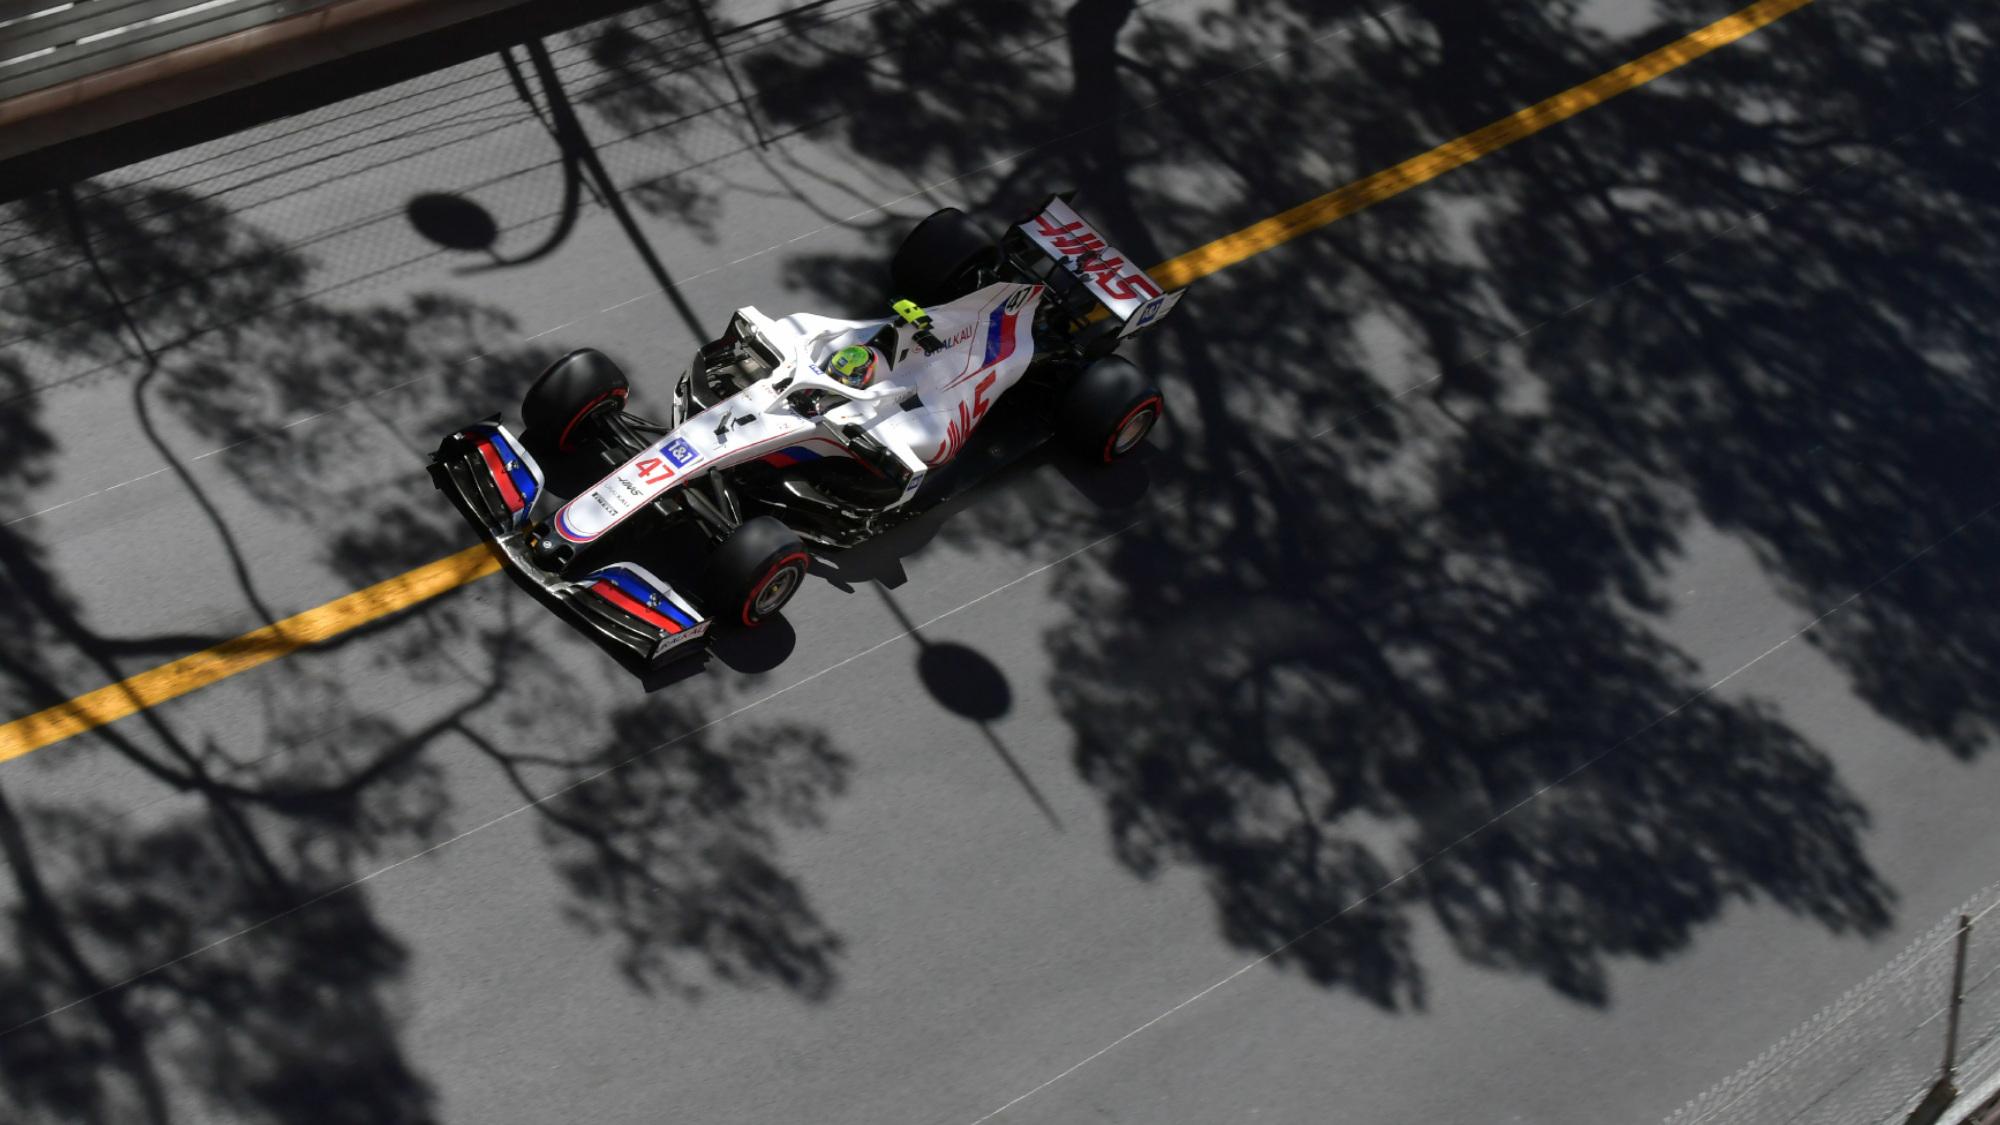 Mick Schumacher, 2021 Monaco GP